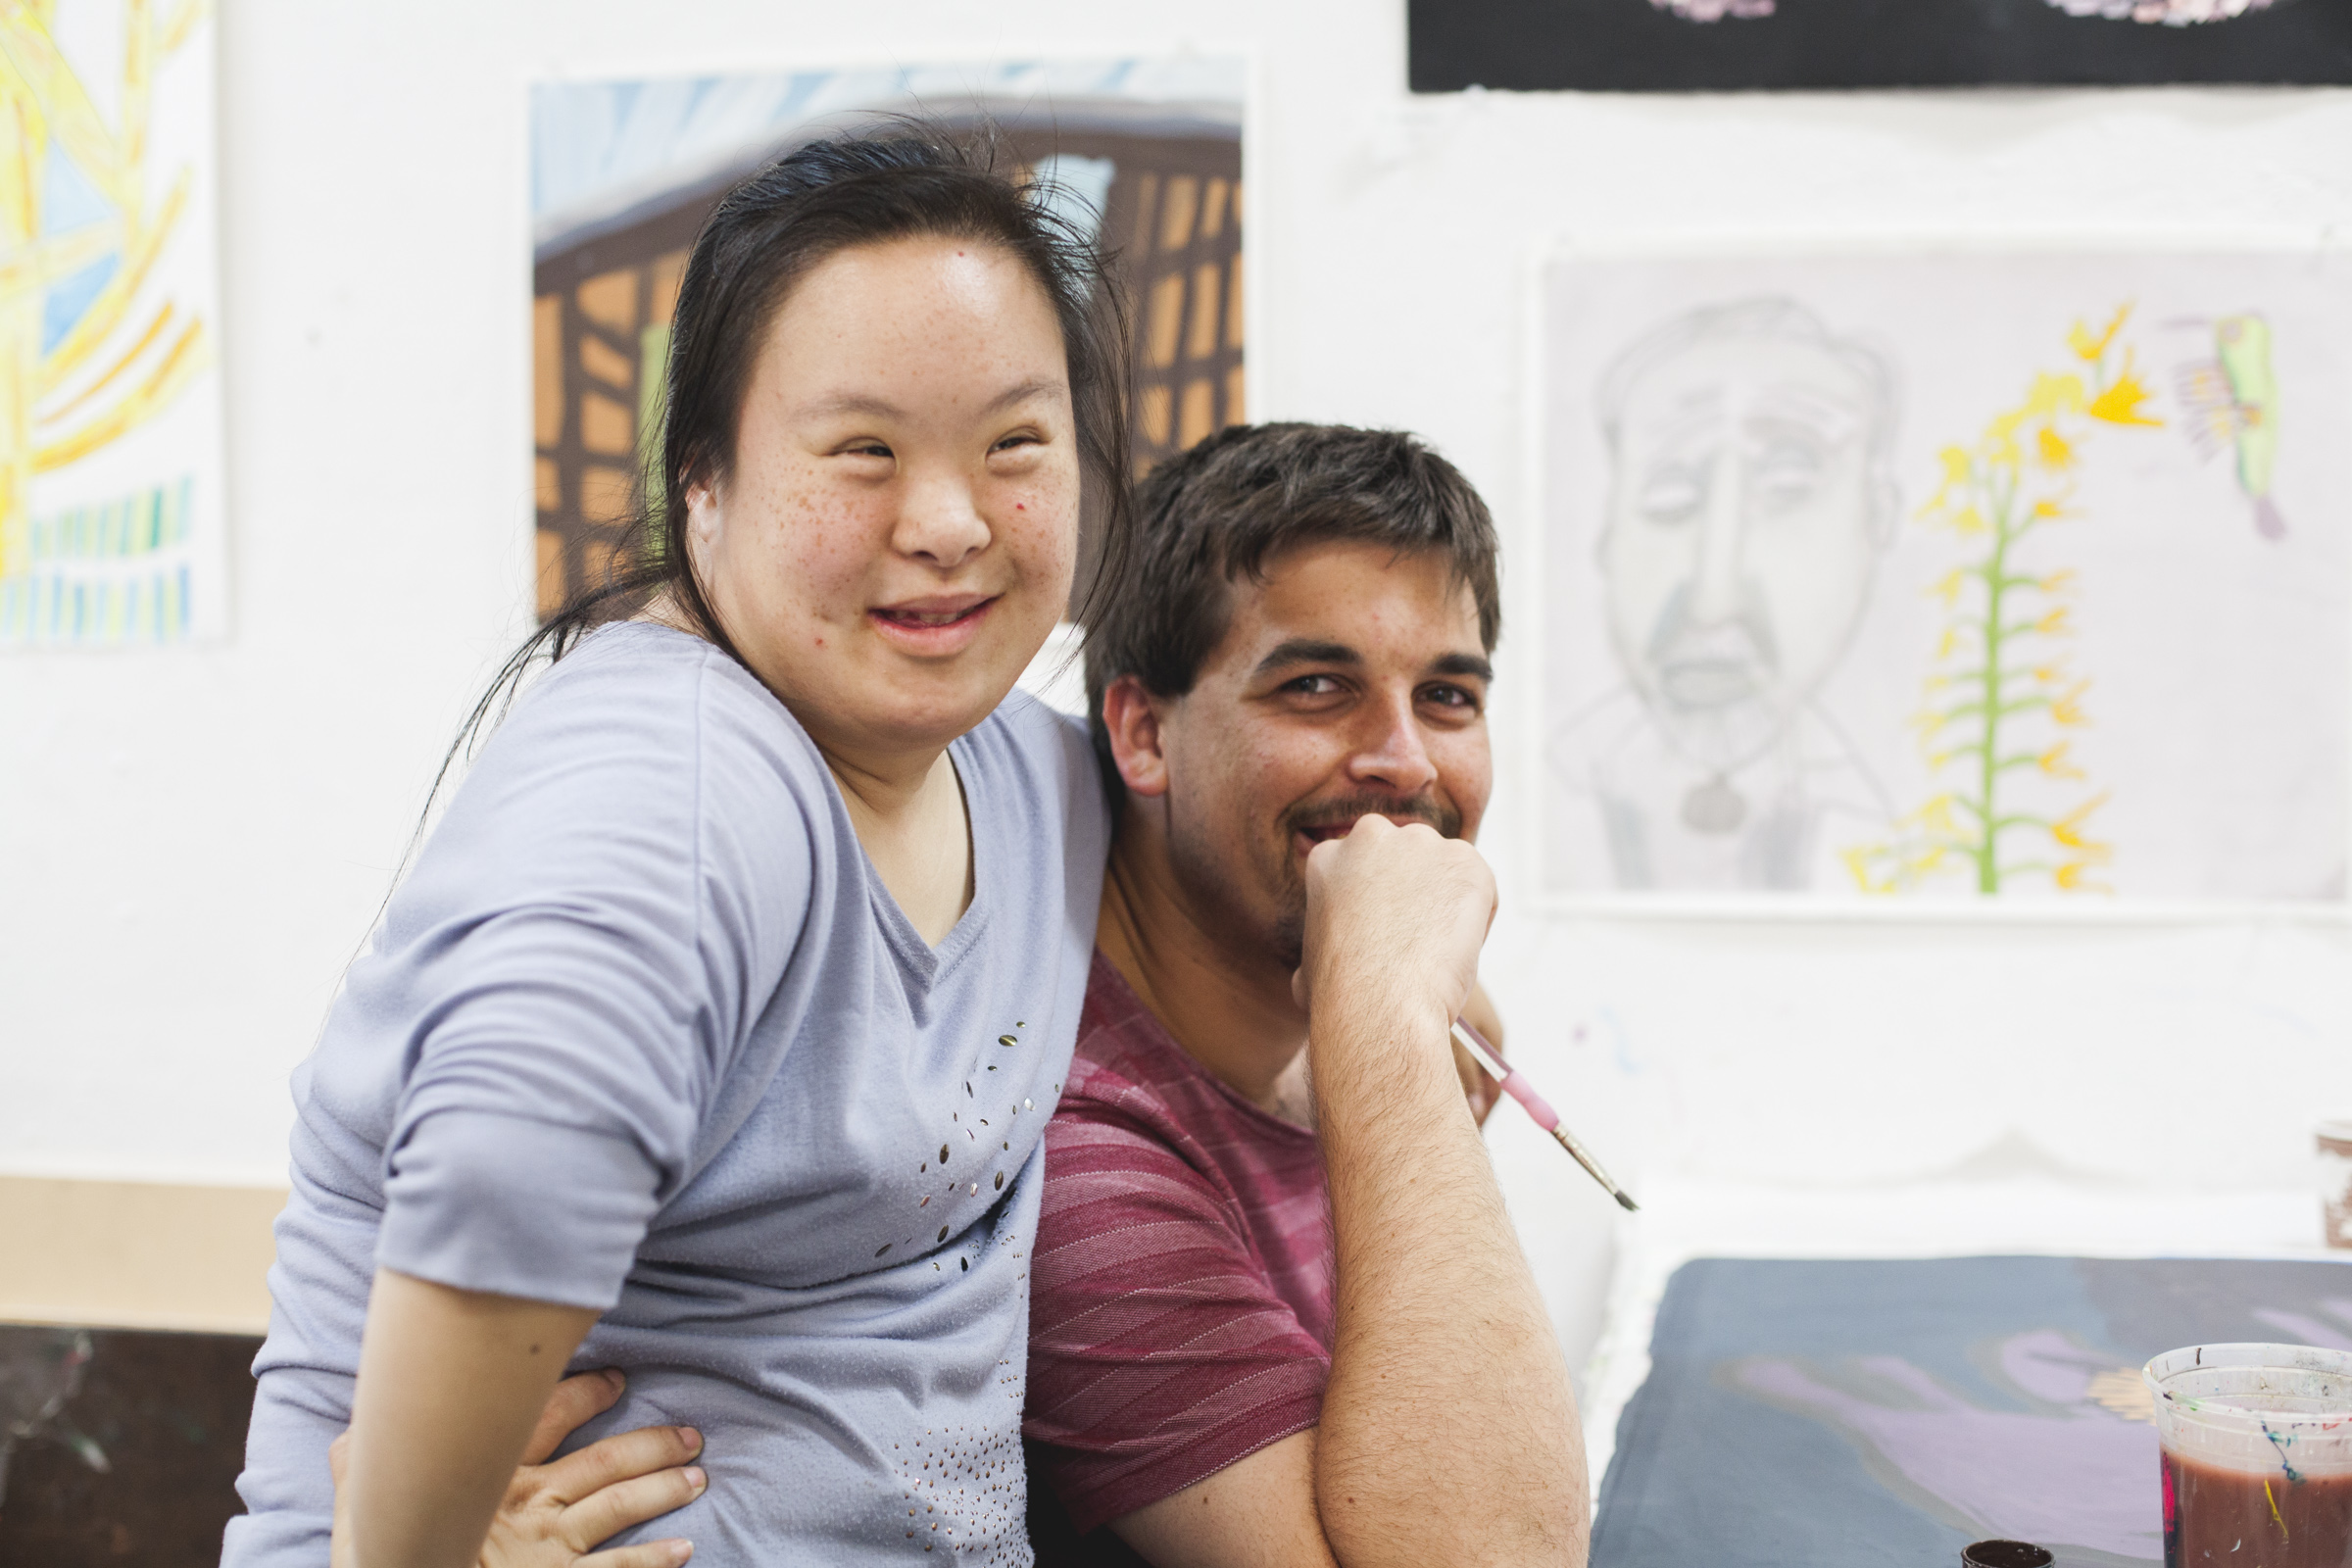 Creativity Explored artists Kathy Wen and Ian Adams